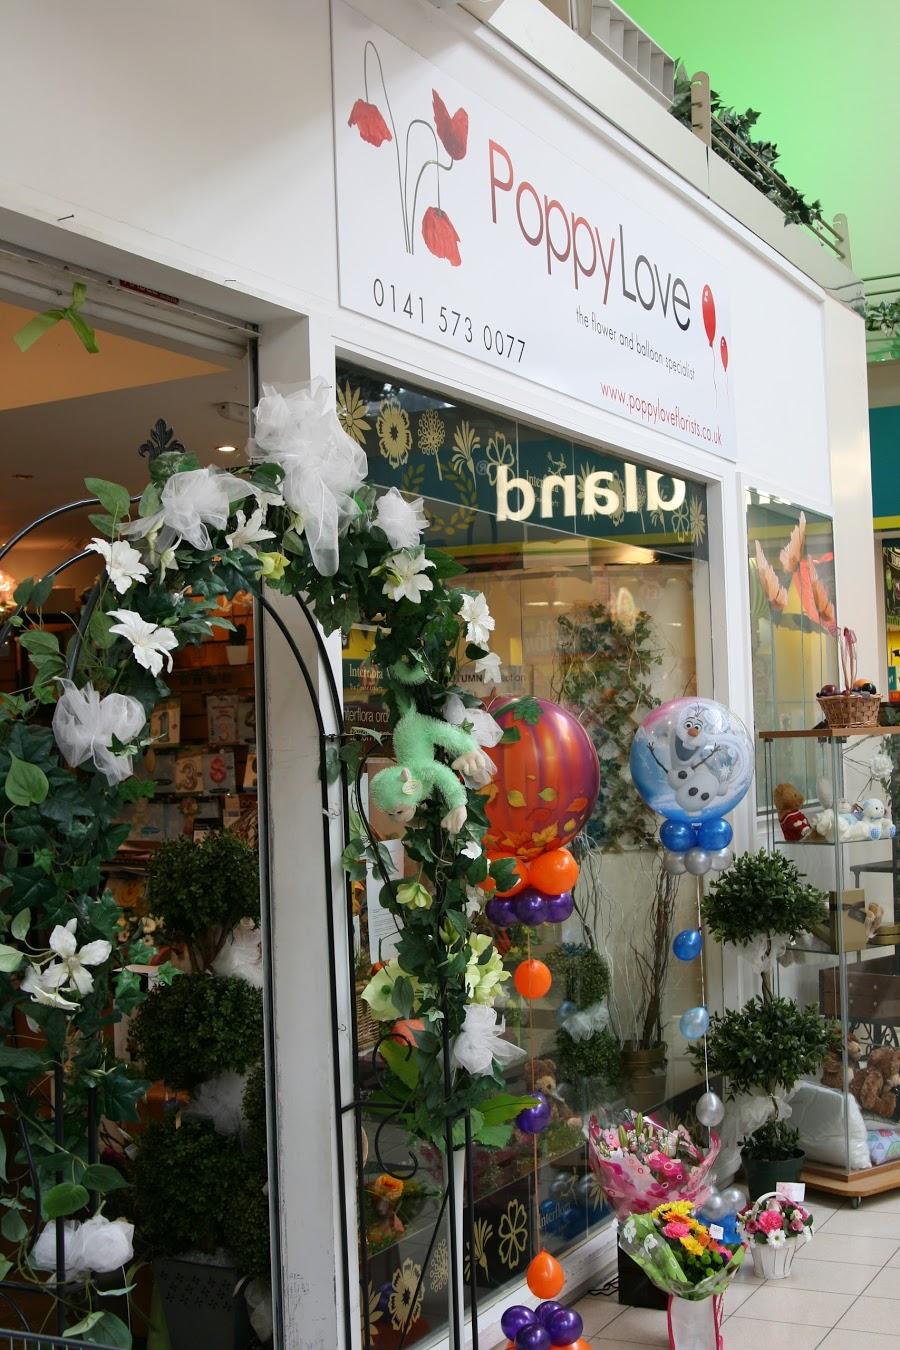 Poppy Love Florist